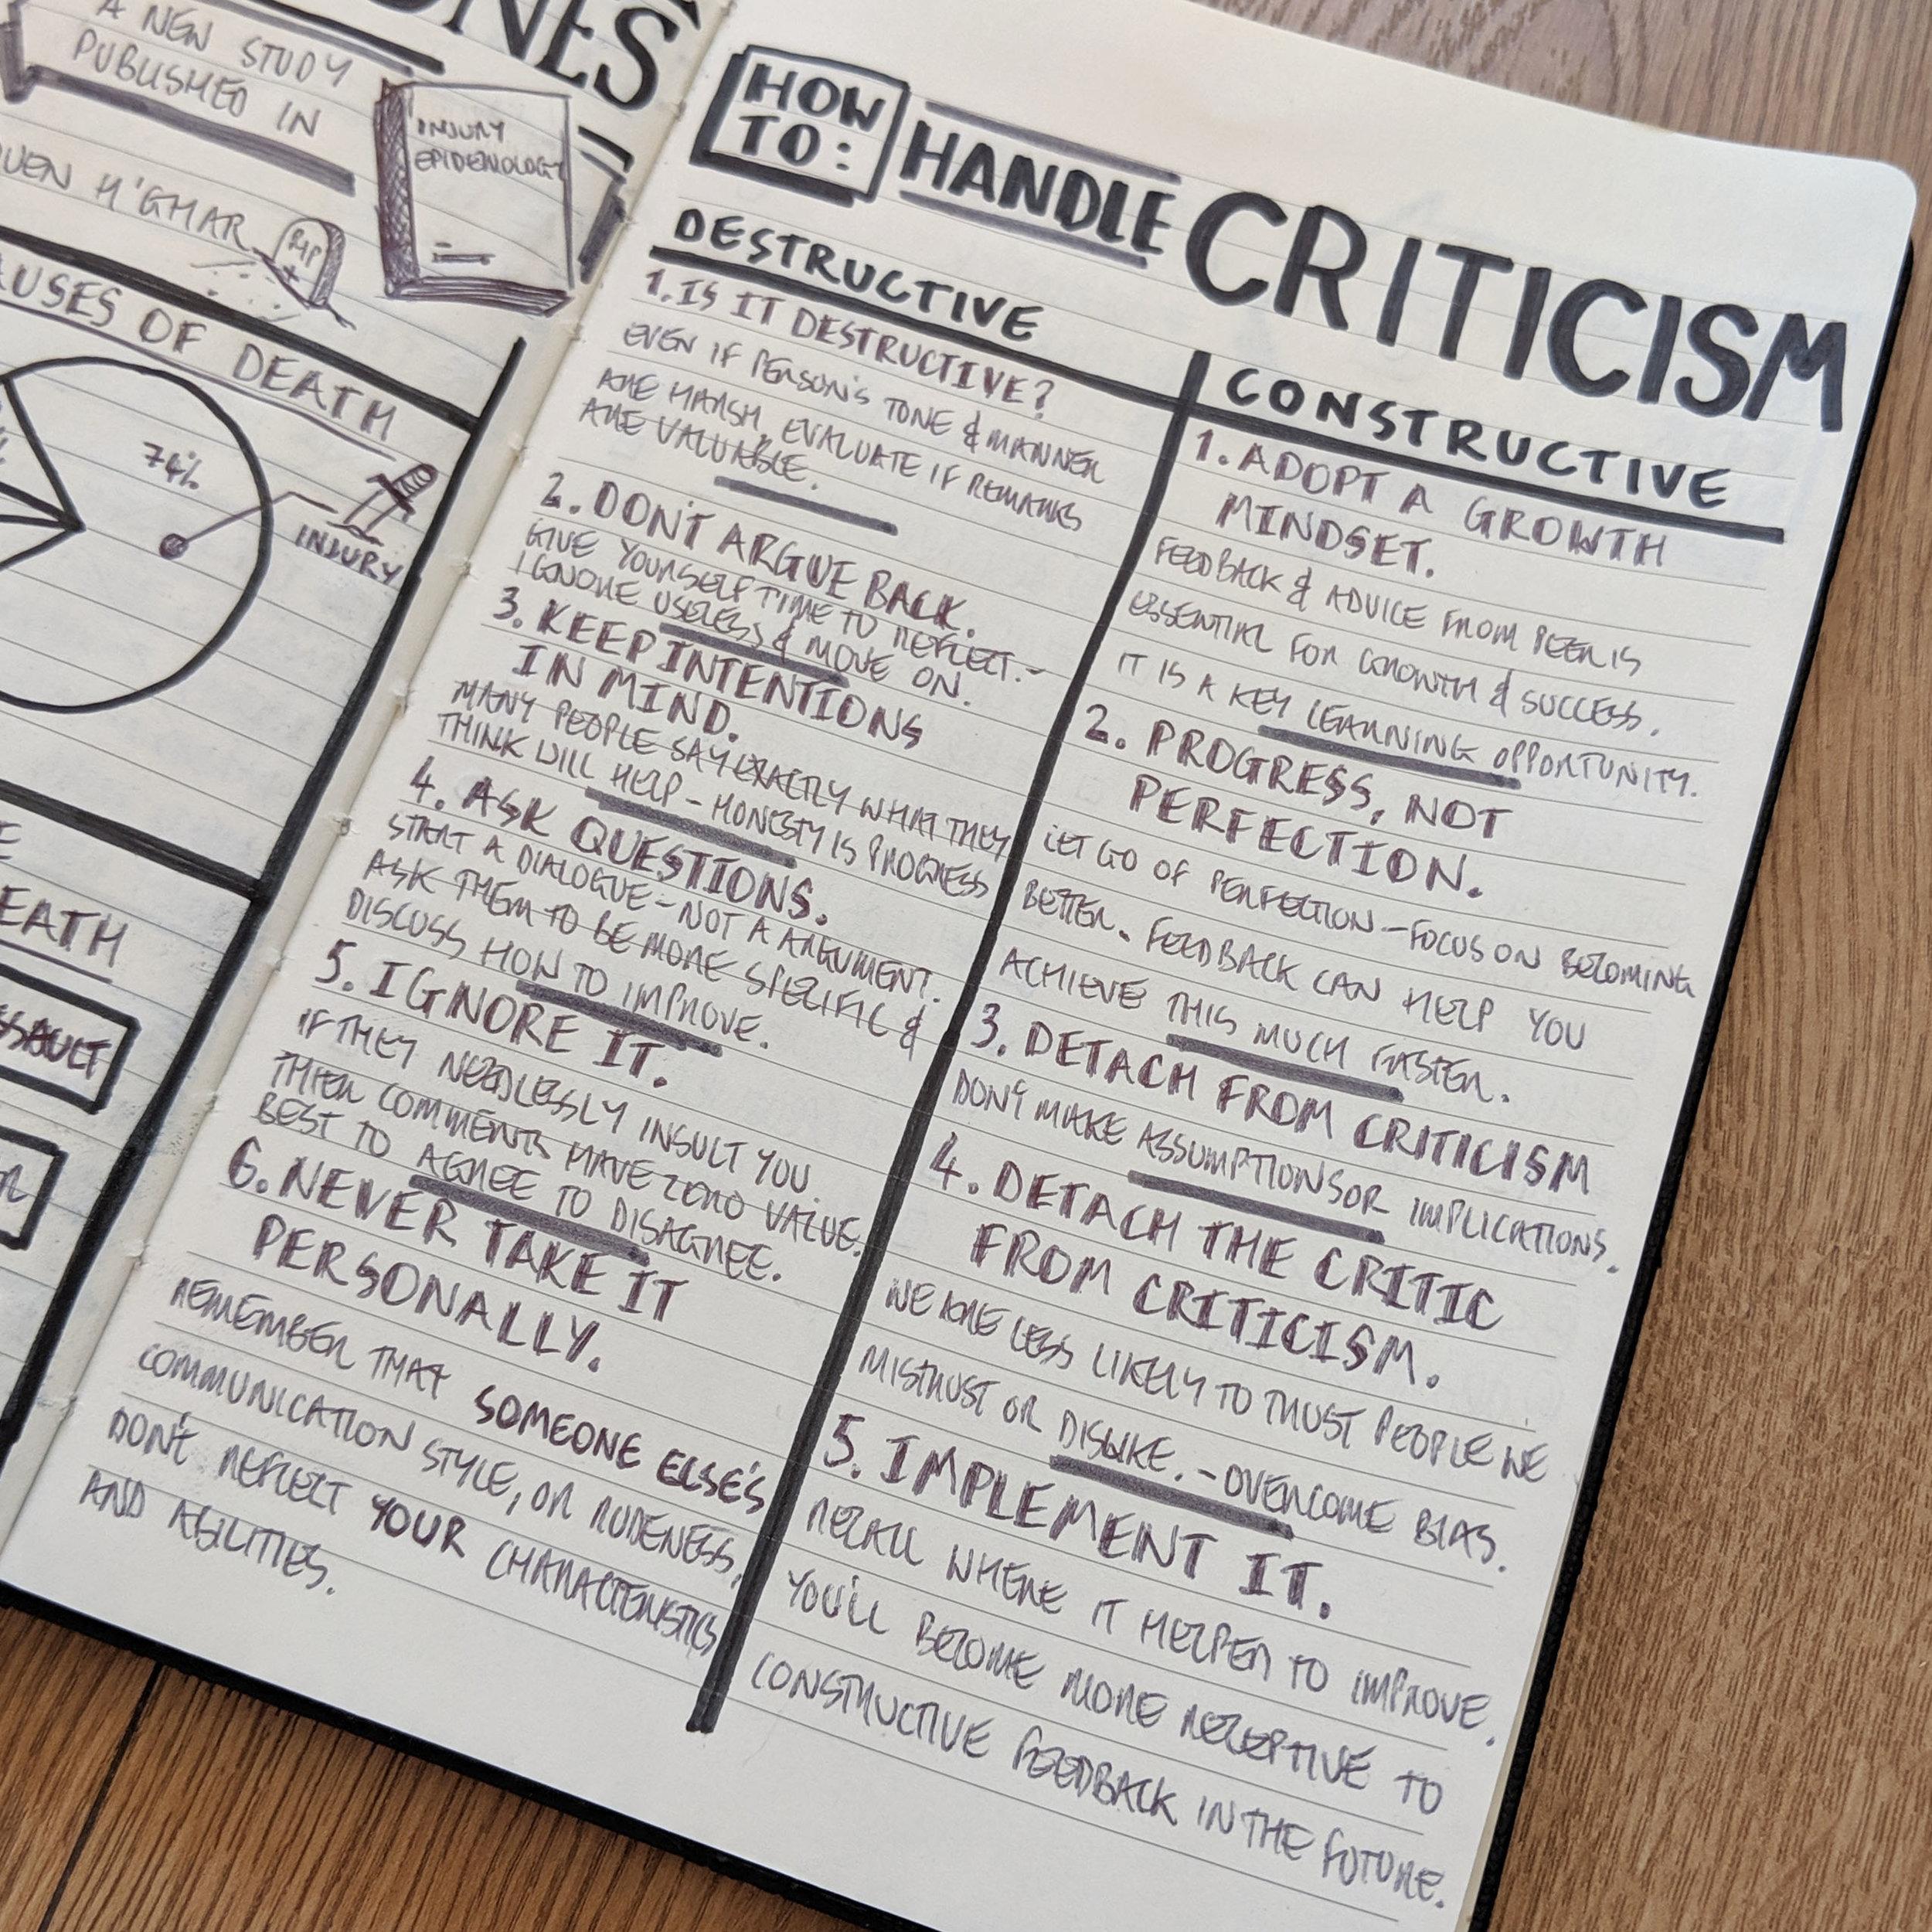 HowToHandleCriticism4.jpg